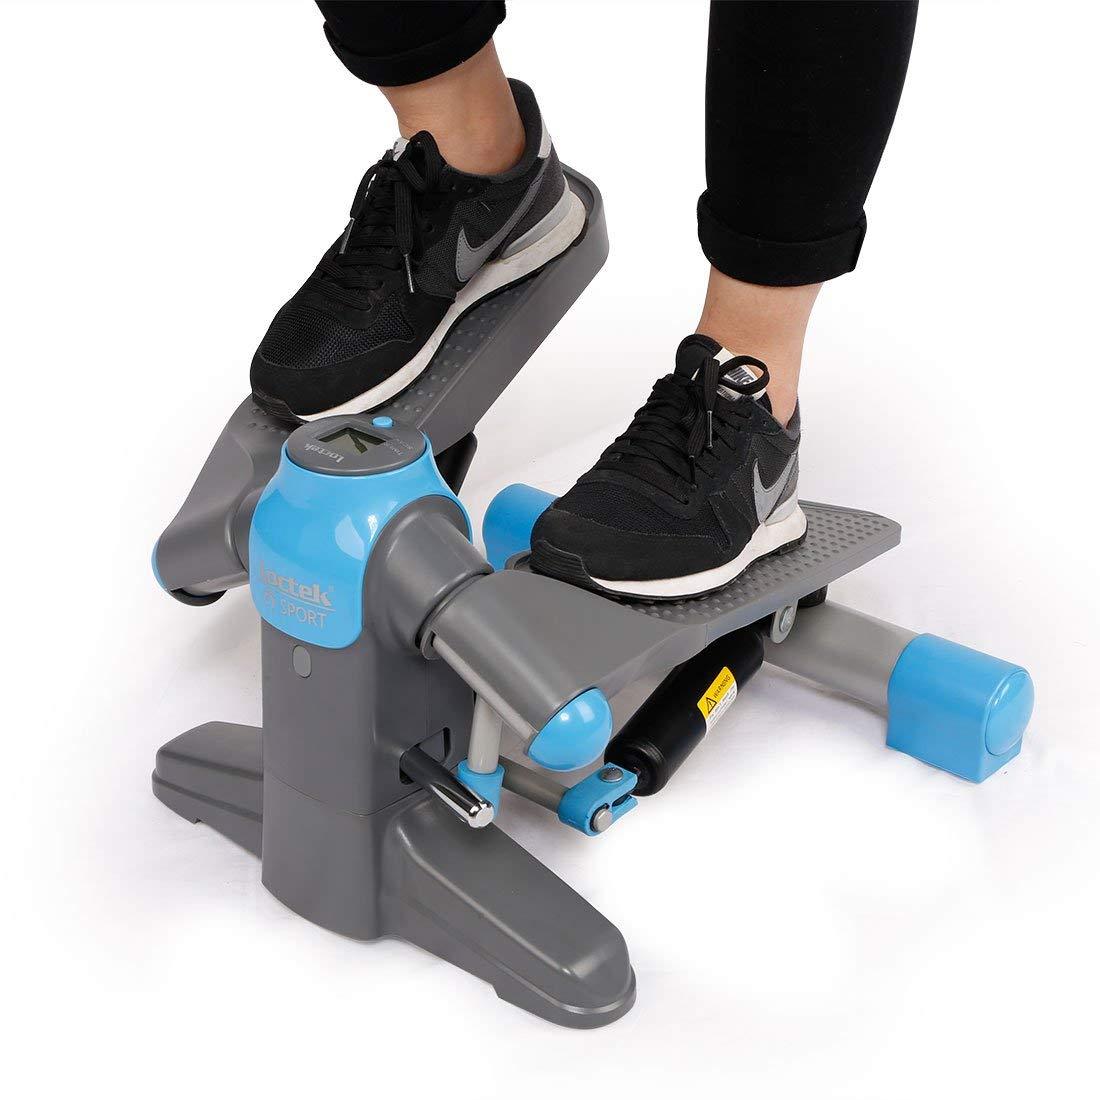 exercice stepper